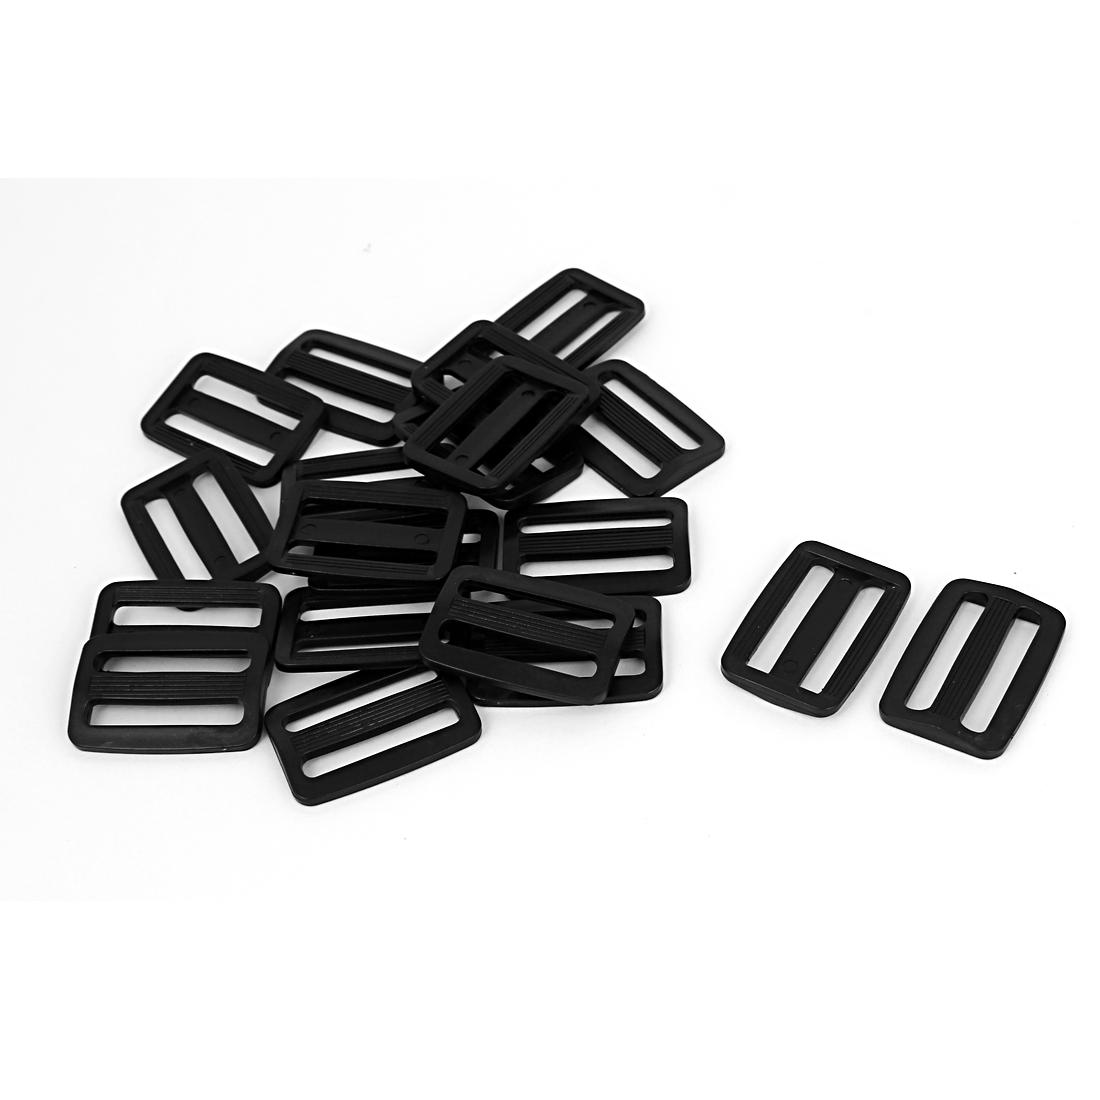 20 Pcs Black Hard Plastic Slide Rectangle Buckle Luggage Bag Replacement 3.2CM